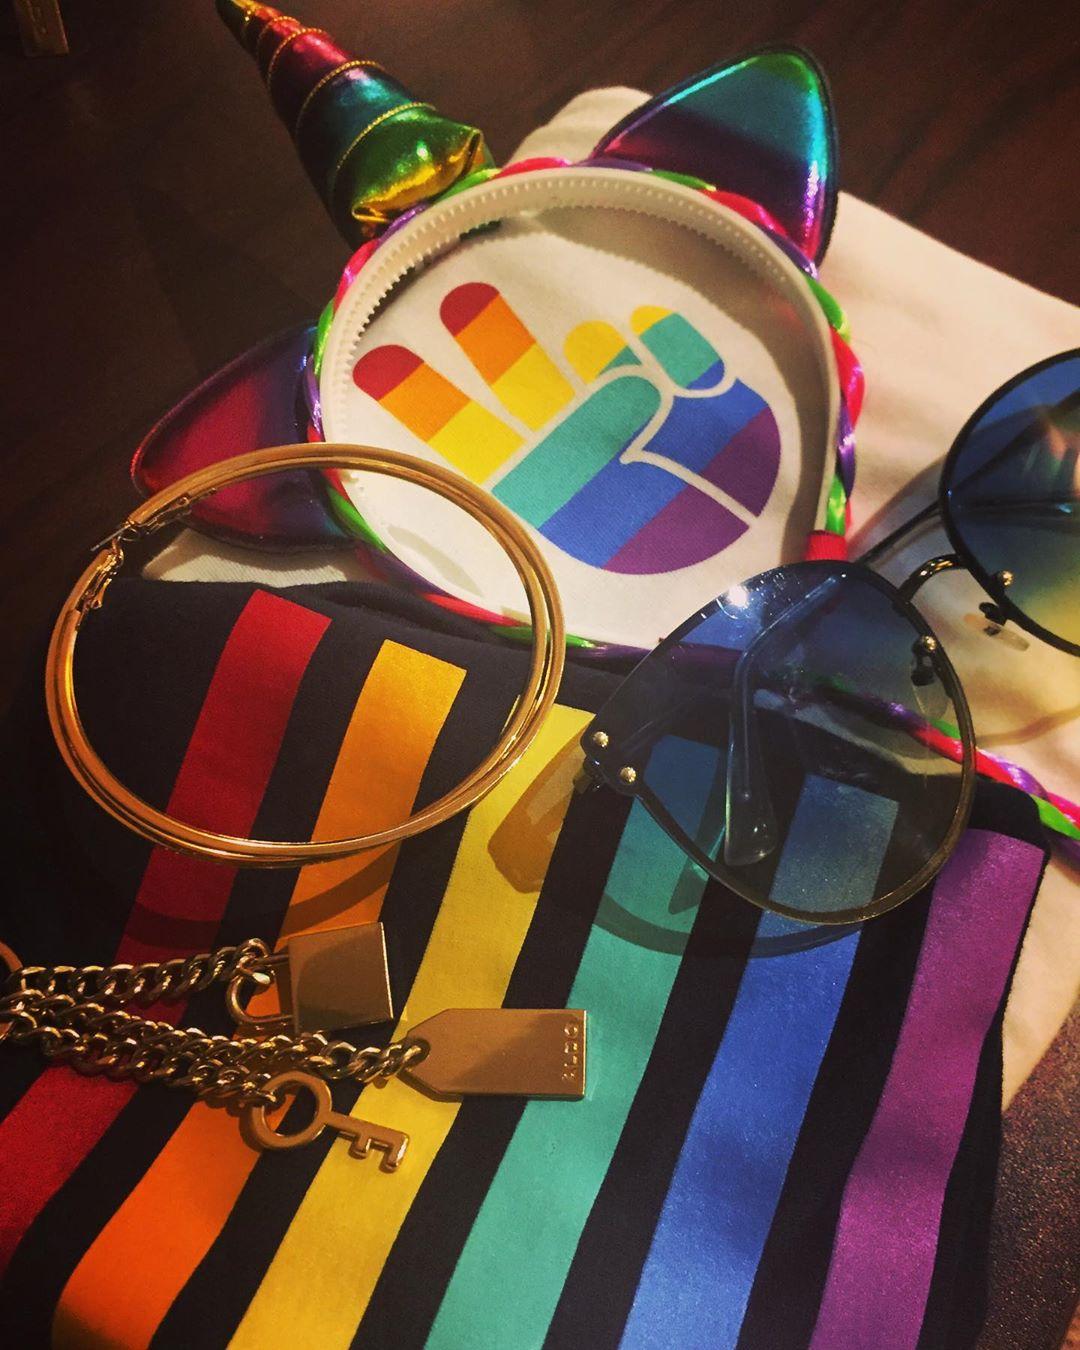 Packing for PRIDE! #pridetoronto #skinnerco